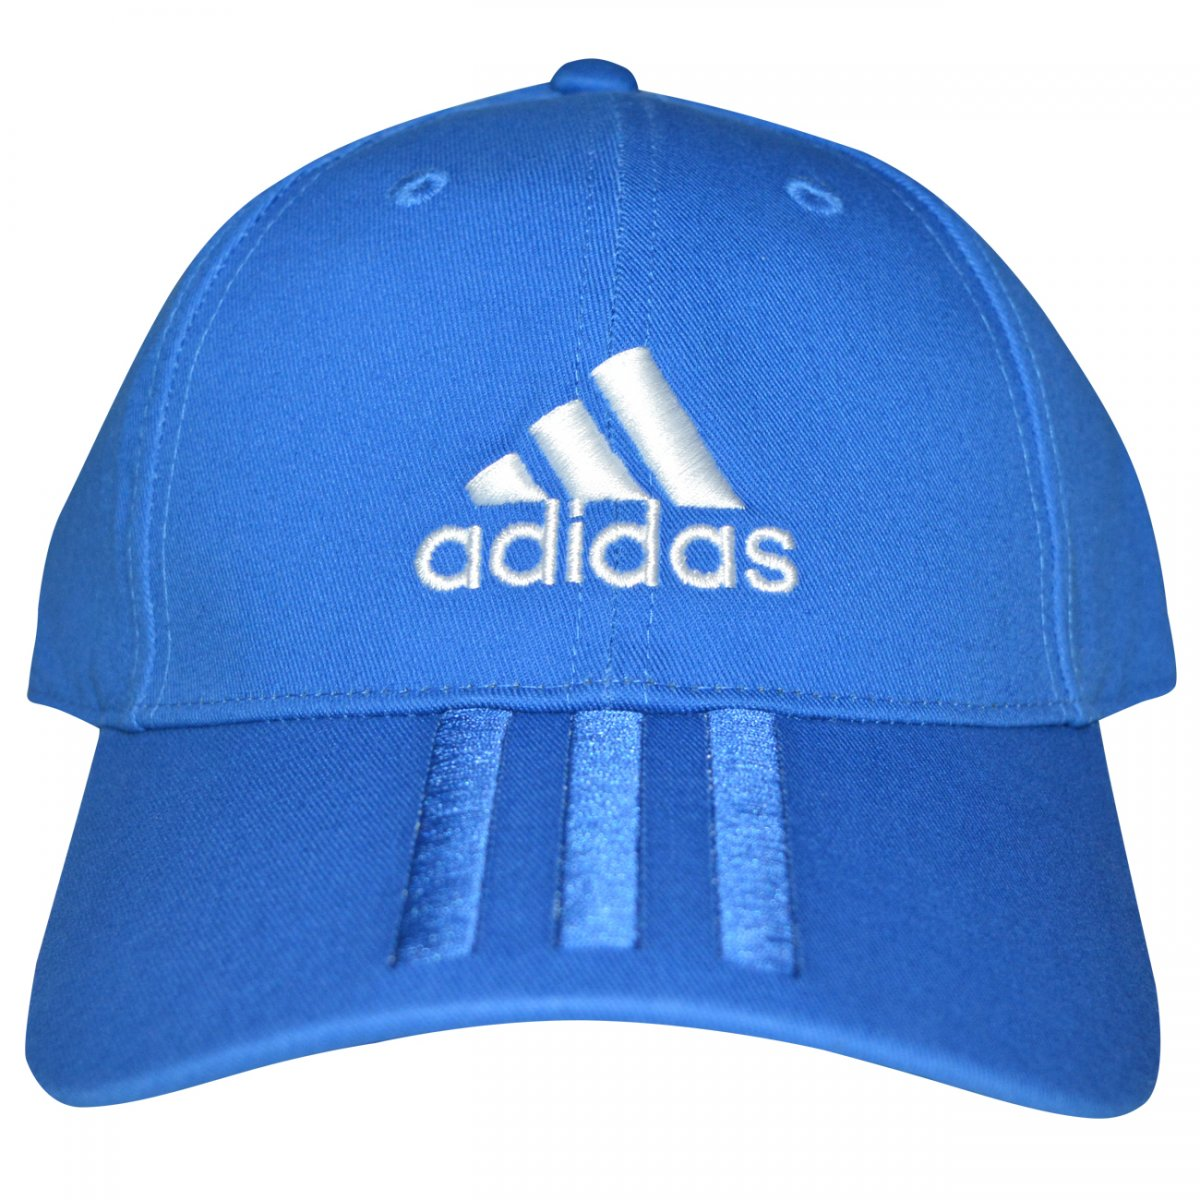 4ff35304c16eb Bone Adidas Tiro Cap BS7469 - Azul azul - Chuteira Nike